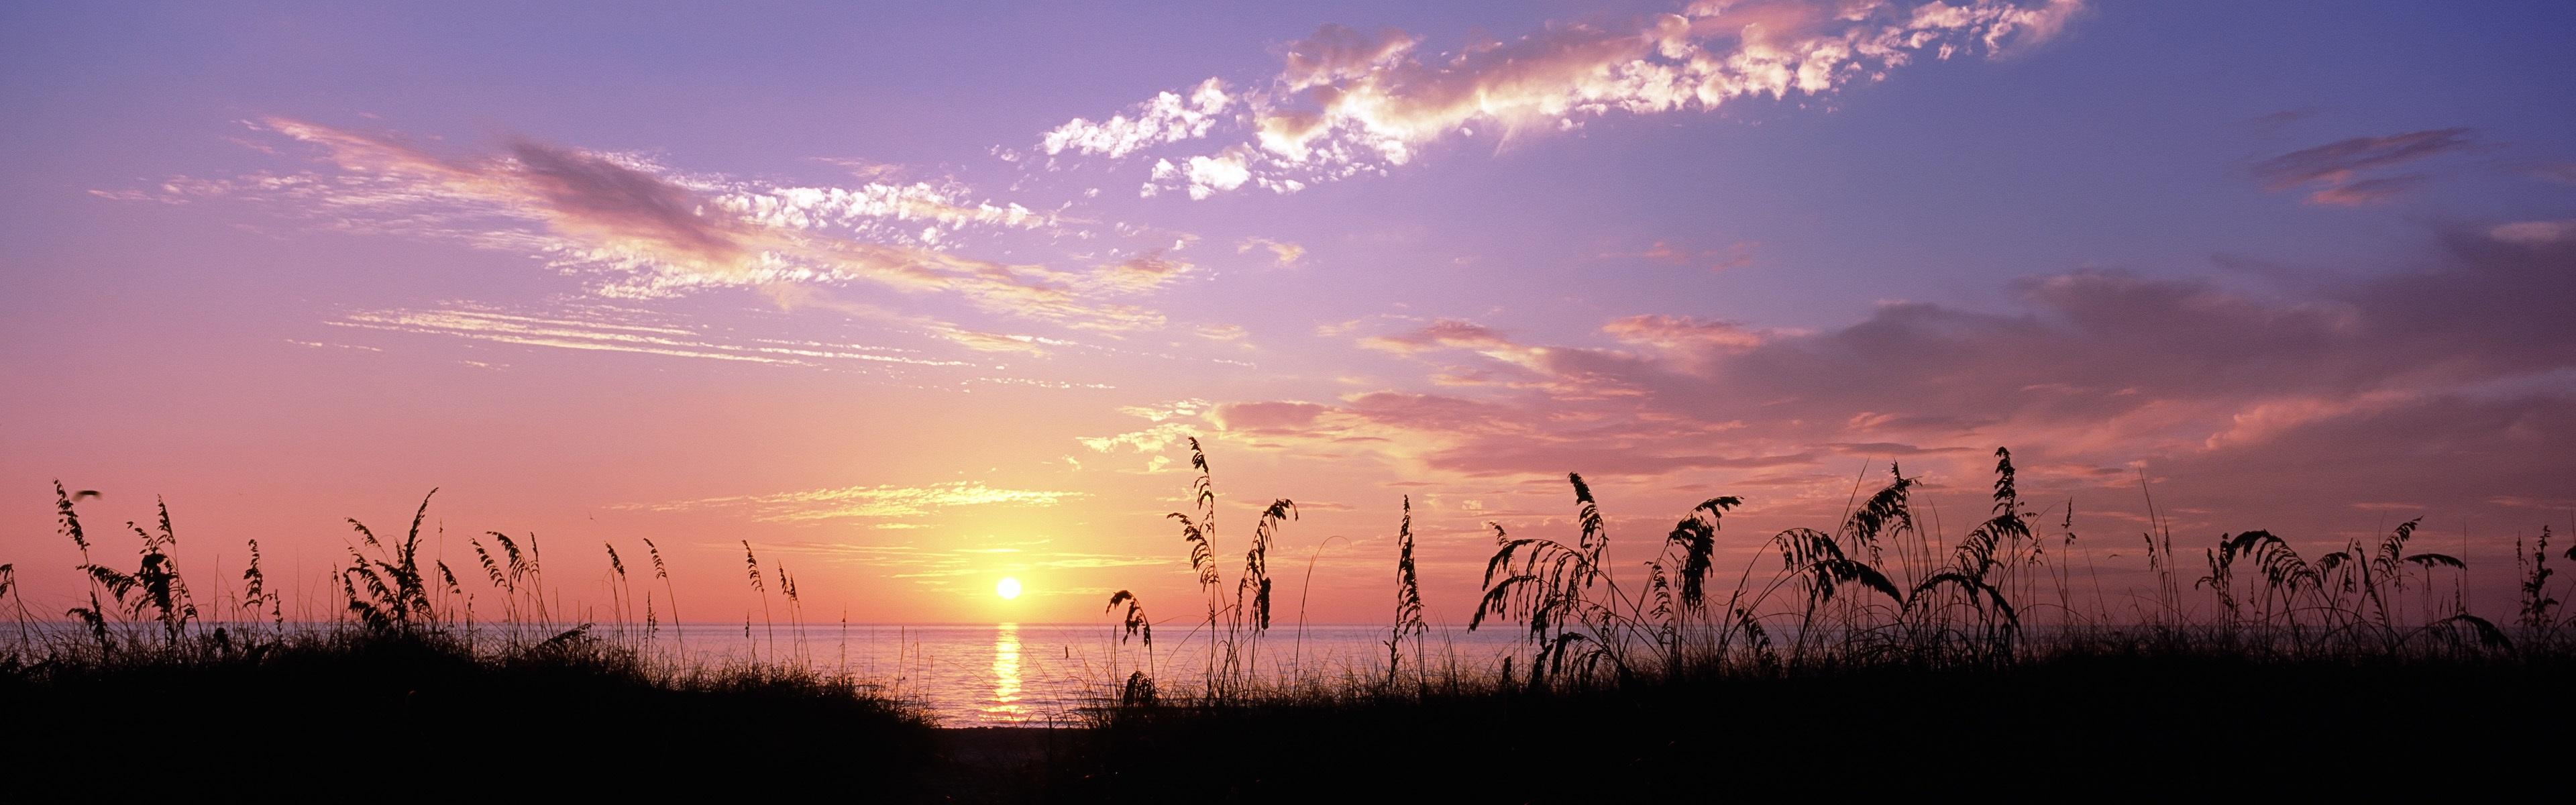 Sea Sunset Grass Venice Beach Florida USA Wallpaper 3840x1200 Multi Monitor